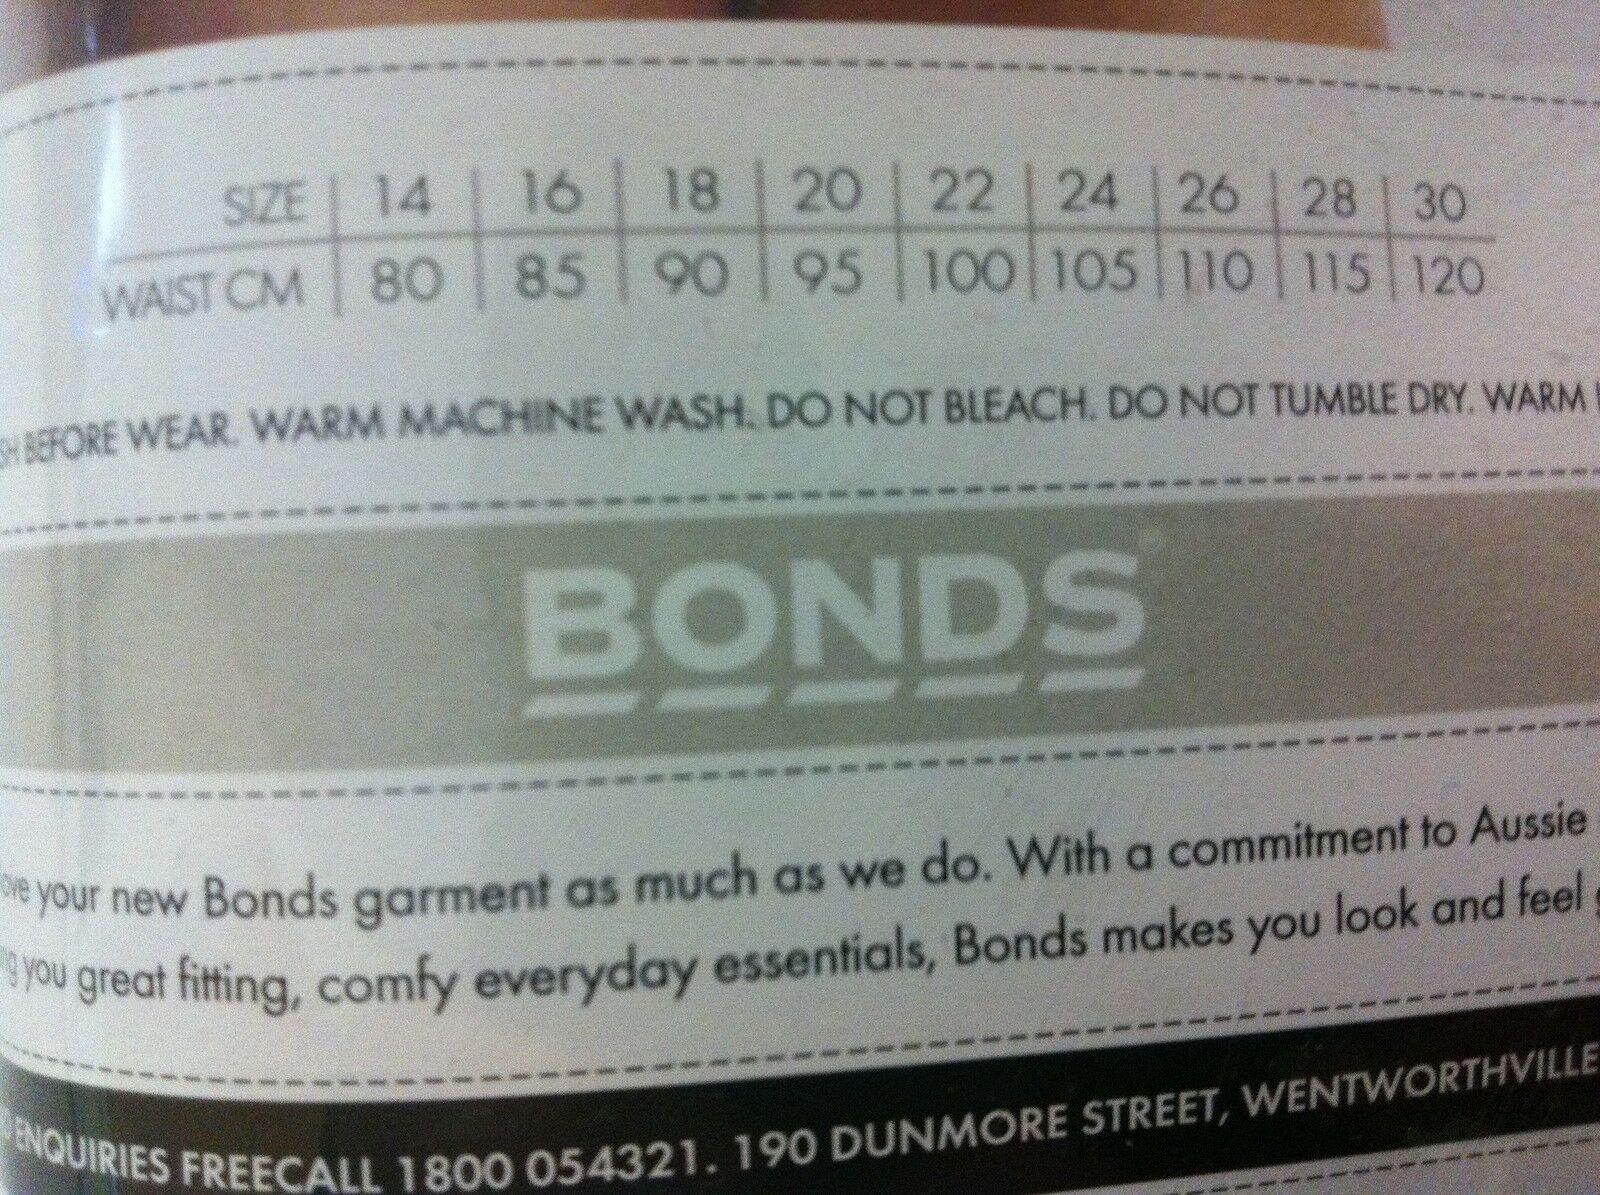 5-20-pairs-x-MENS-BONDS-UNDERWEAR-Guyfront-Trunks-Briefs-Boxer-Shorts-Size-S-XXL thumbnail 16